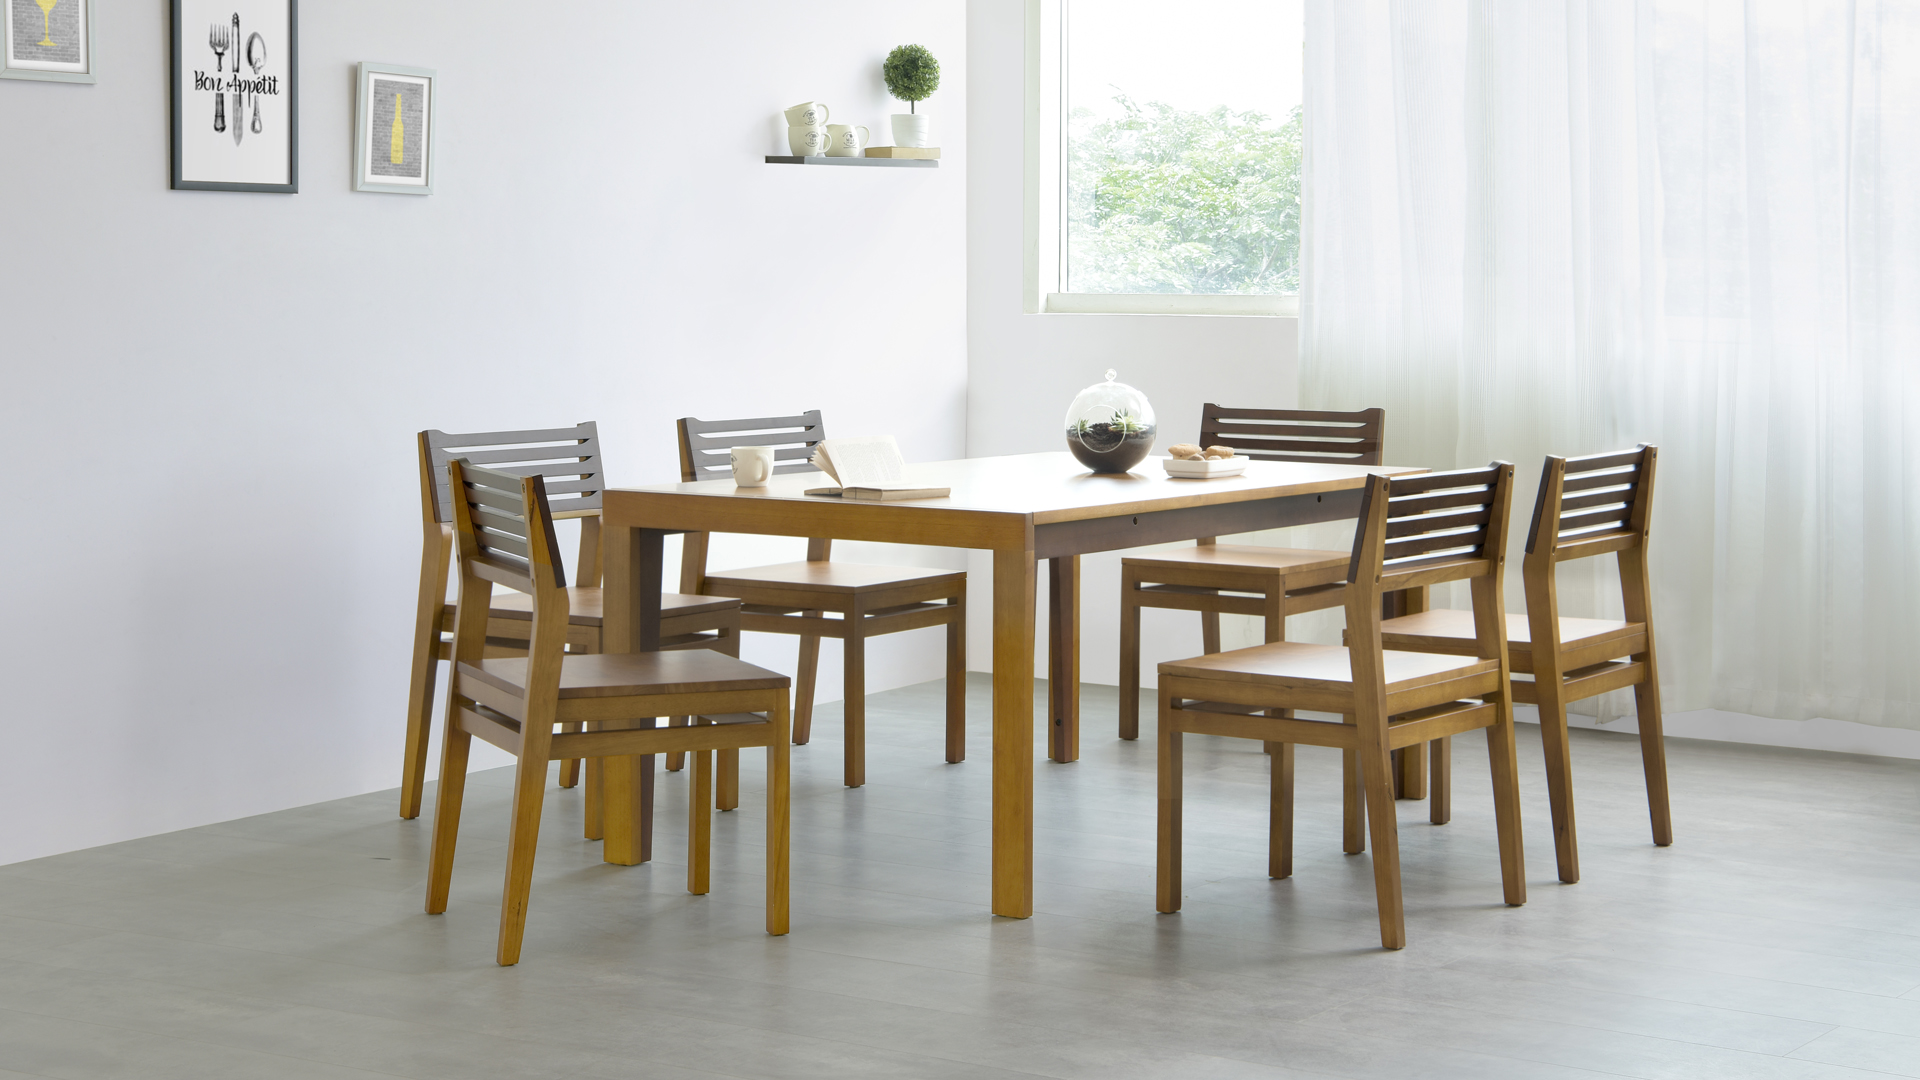 Furlenco furniture